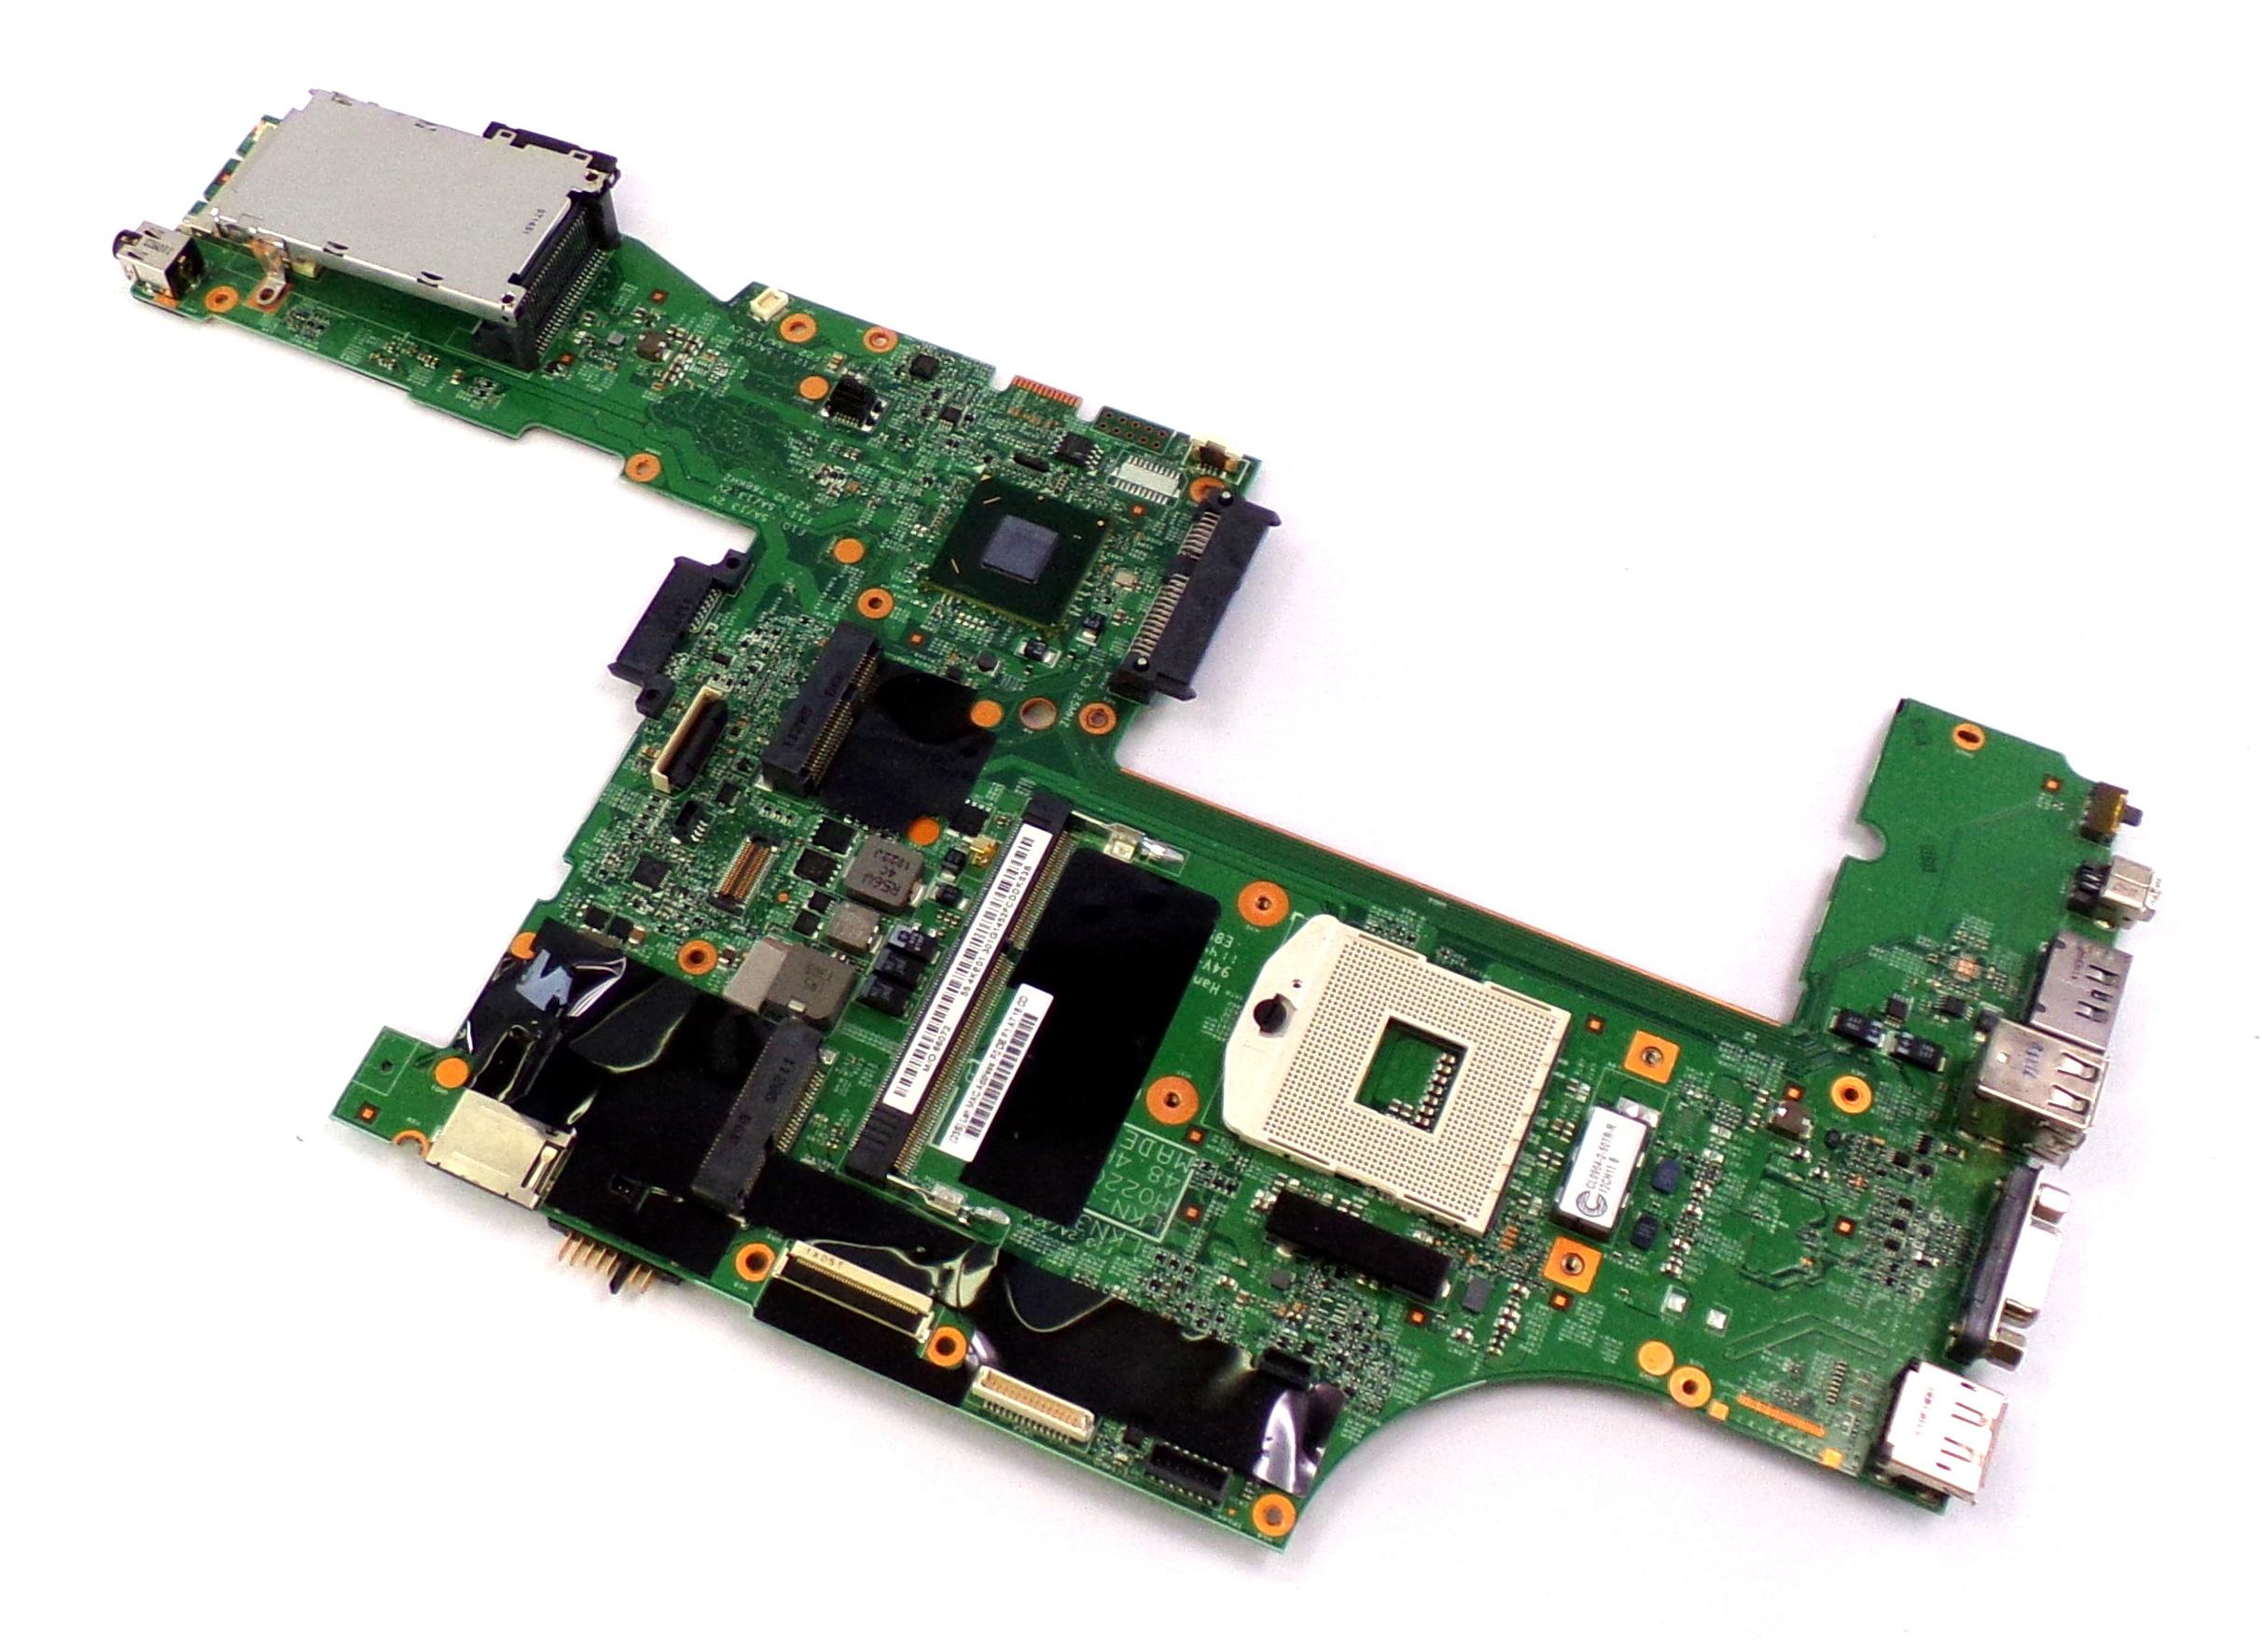 Lenovo 55.4KE01.301 ThinkPad T520 Socket rPGA-989 Motherboard